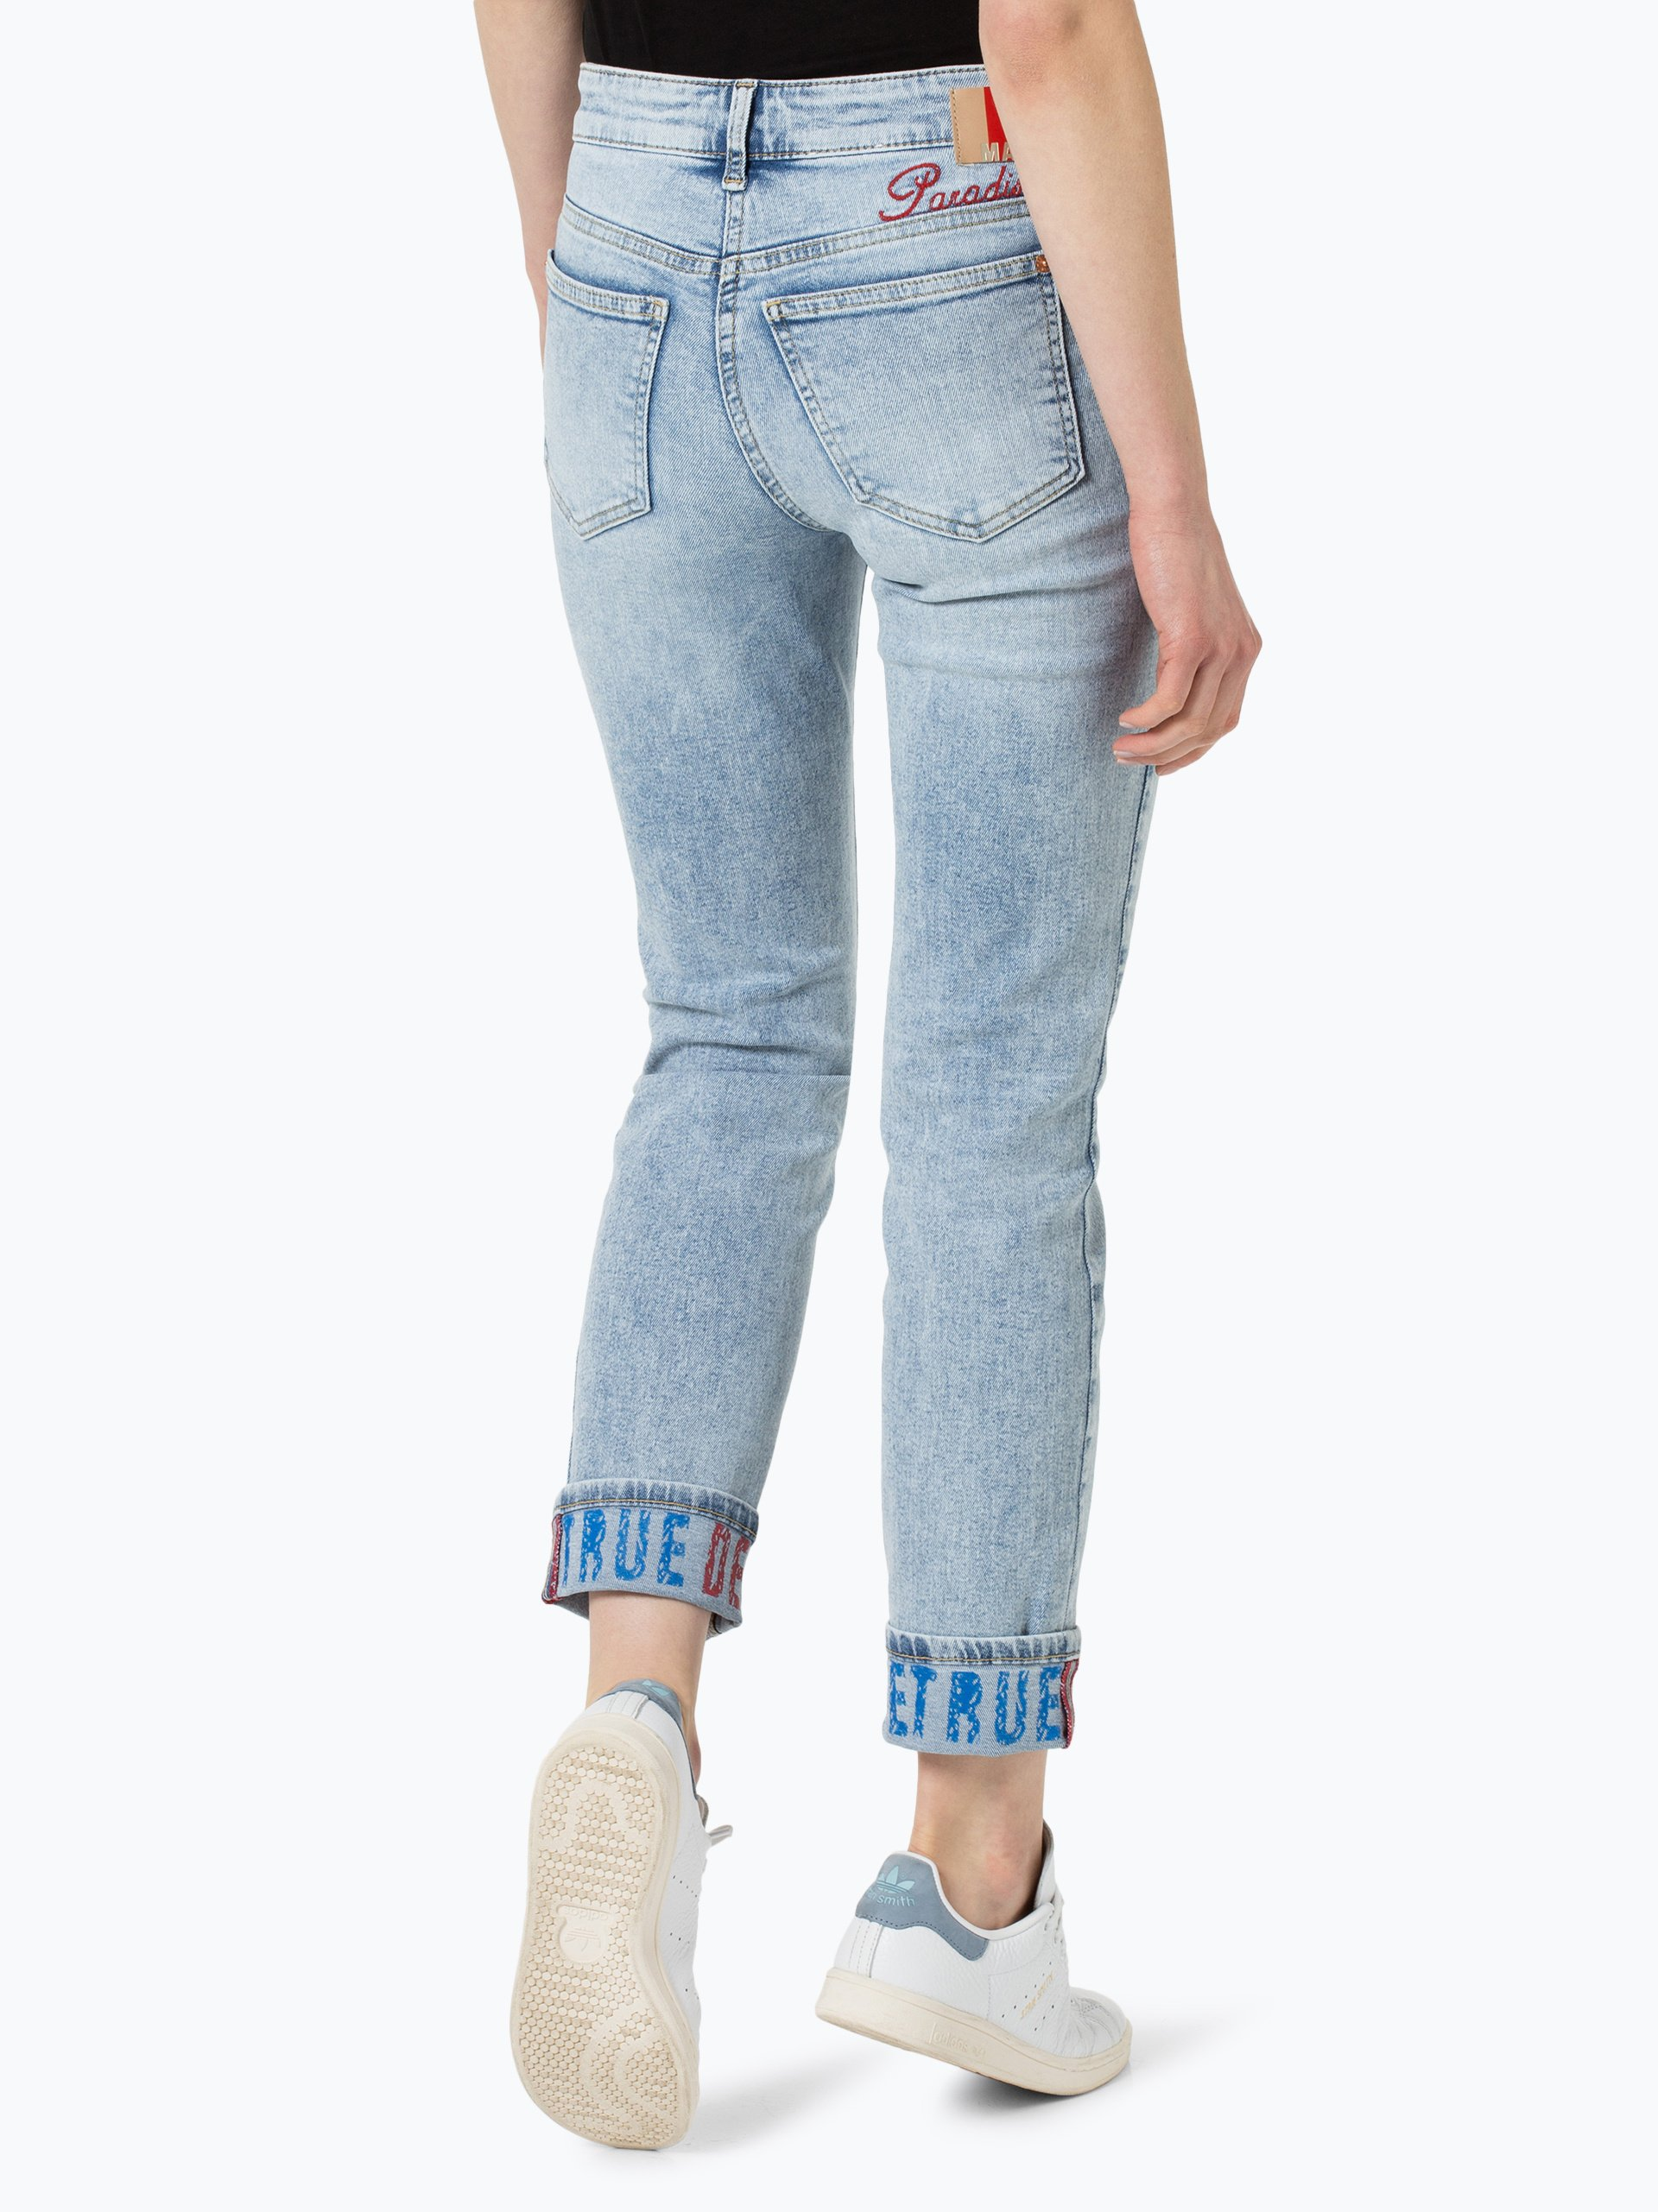 mac damen jeans angela denim bedruckt online kaufen. Black Bedroom Furniture Sets. Home Design Ideas